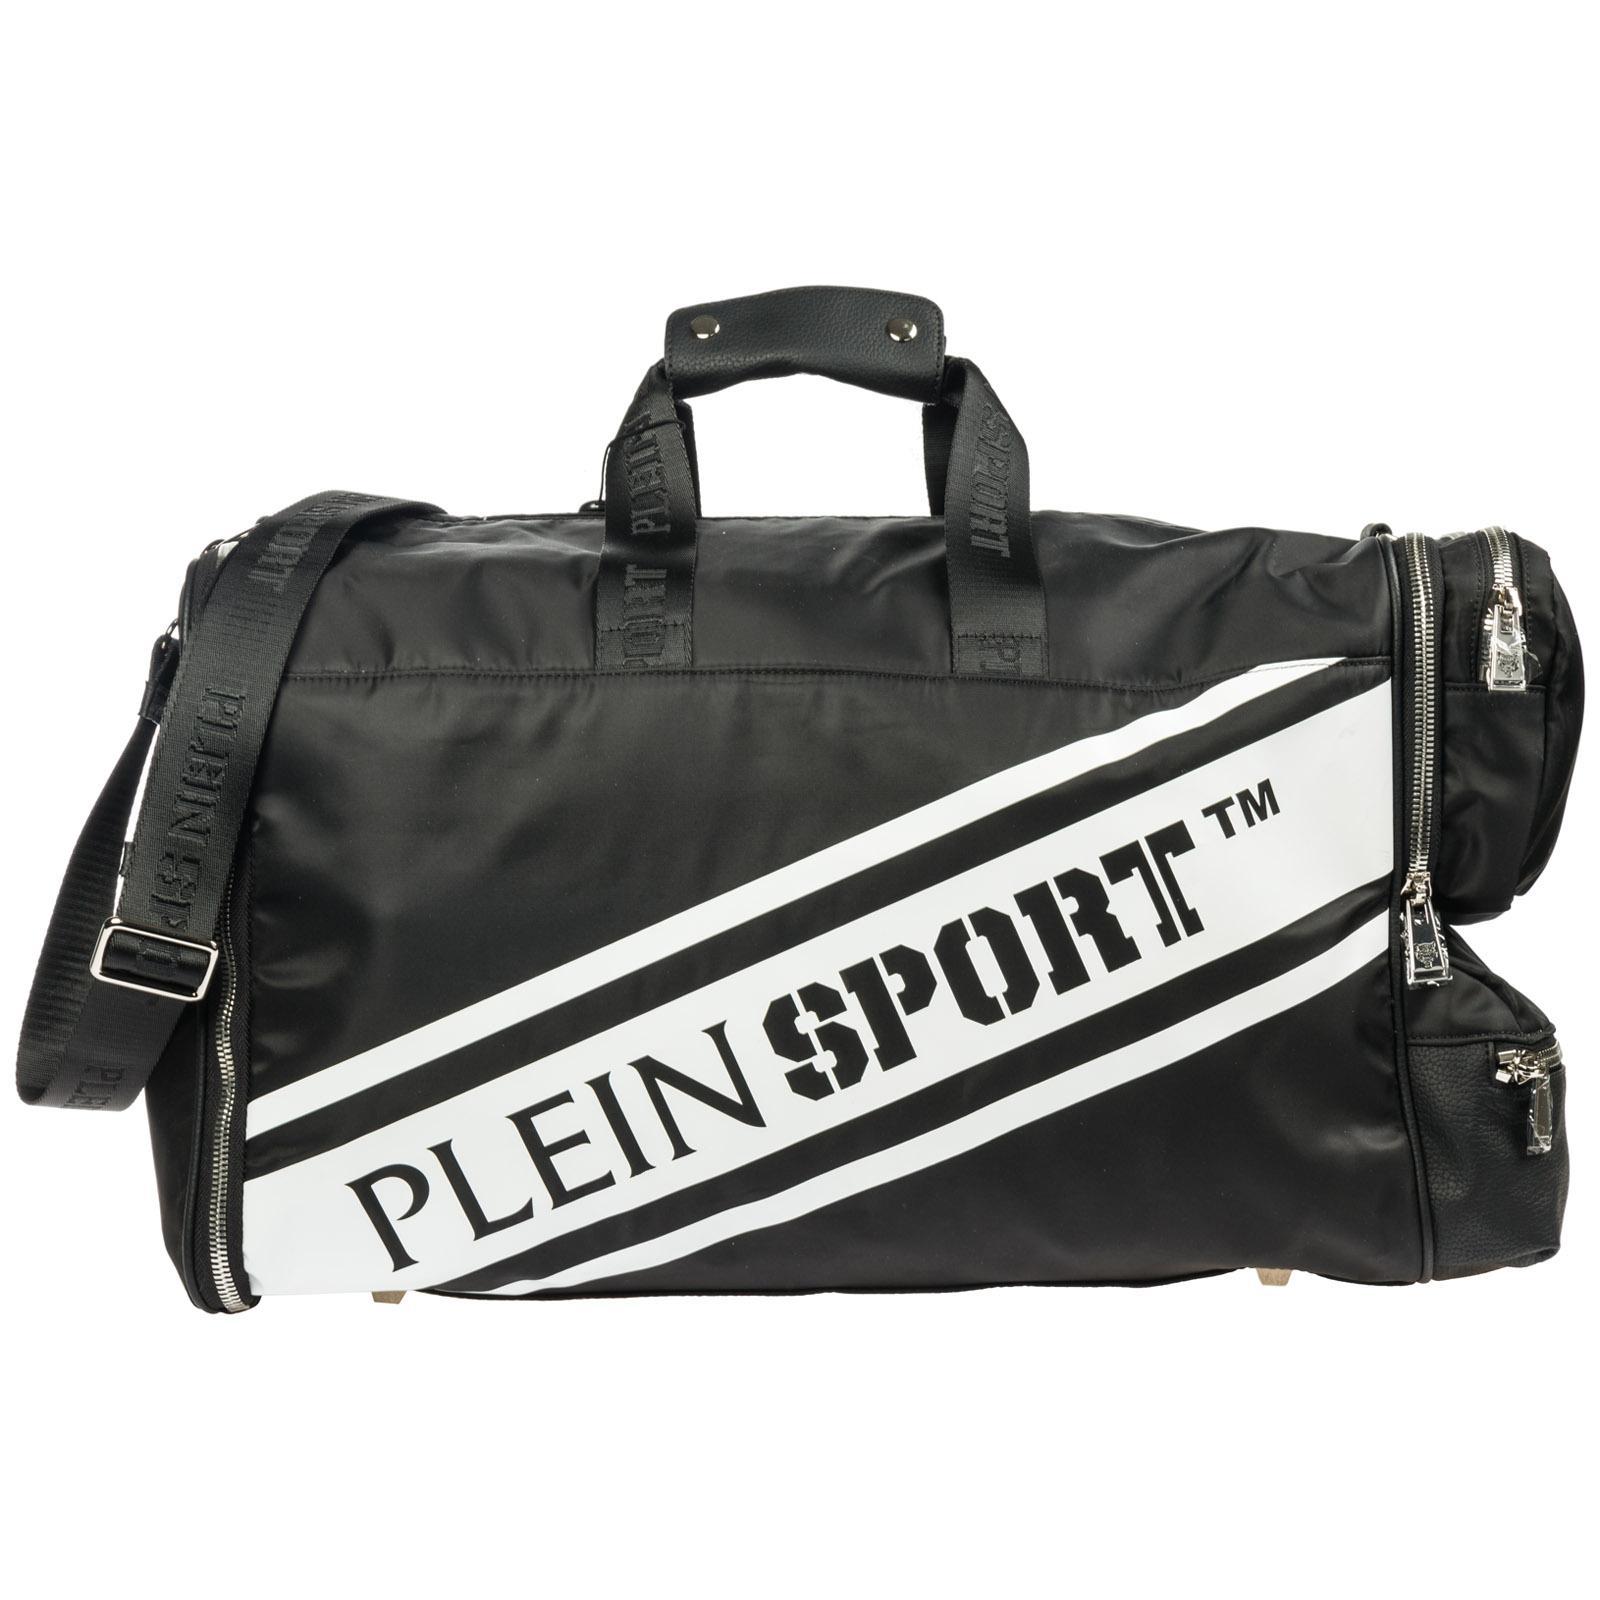 c3da8407a5 Philipp Plein Travel Duffle Weekend Shoulder Bag Nylon in Black for ...